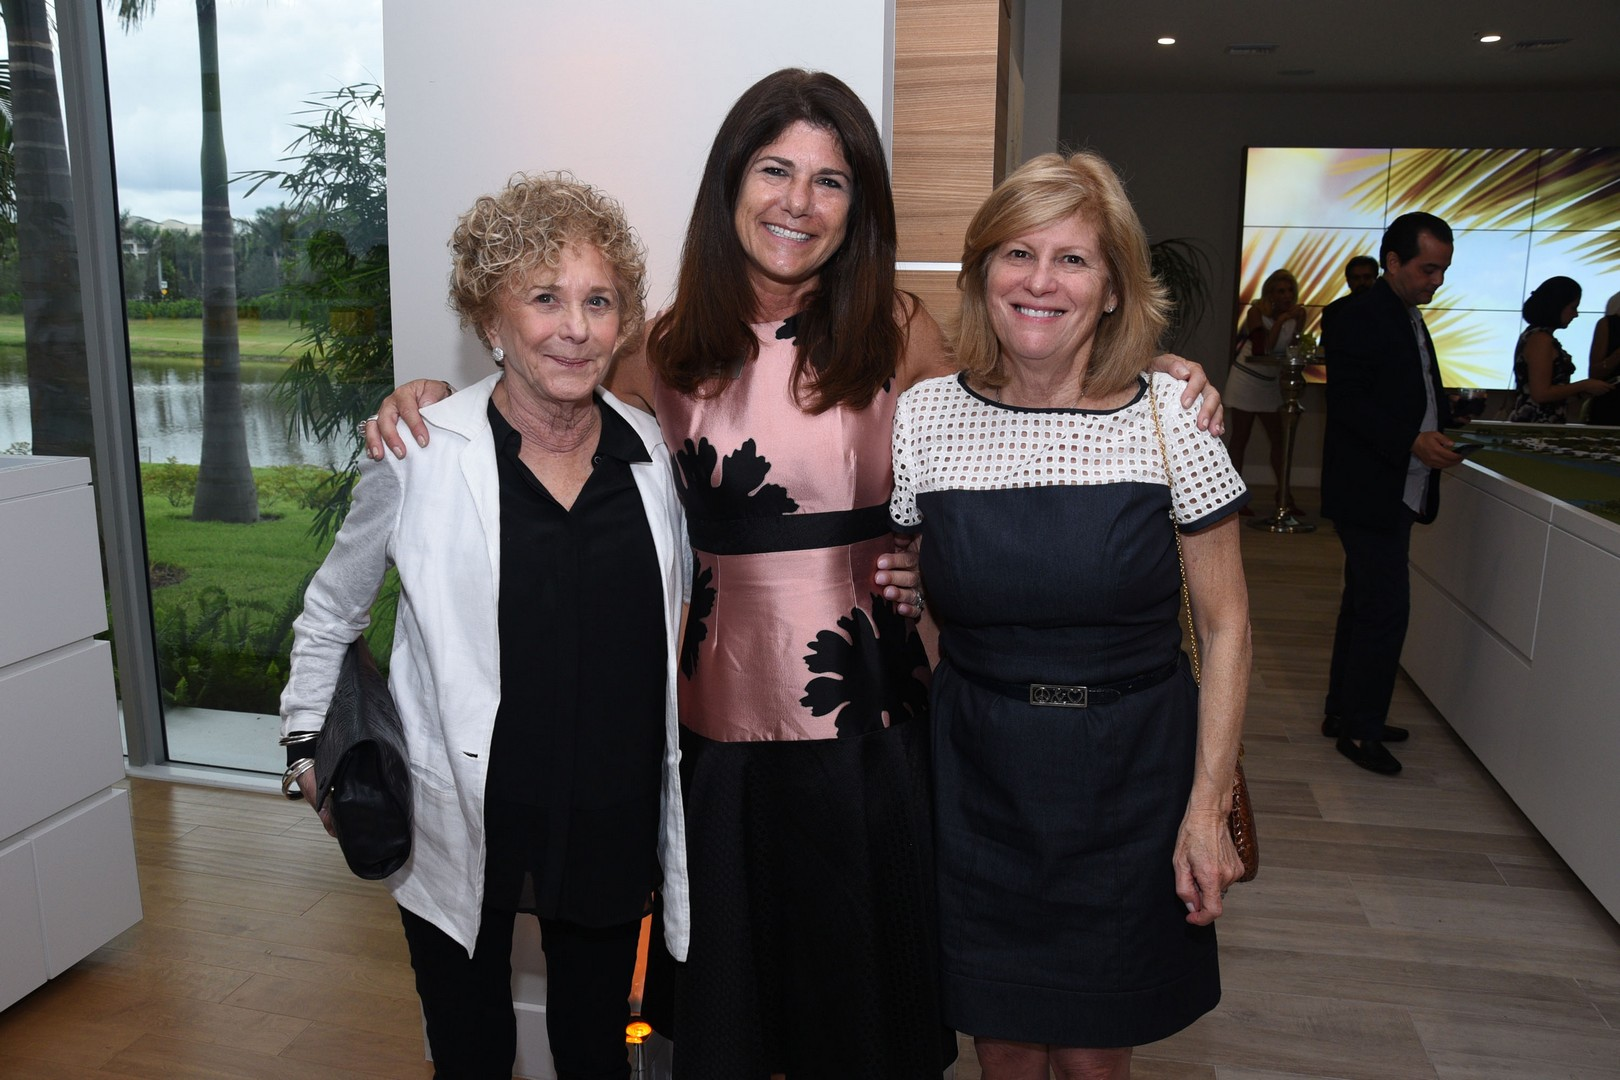 Toby Zack, Michelle Simon , & Debby Gold